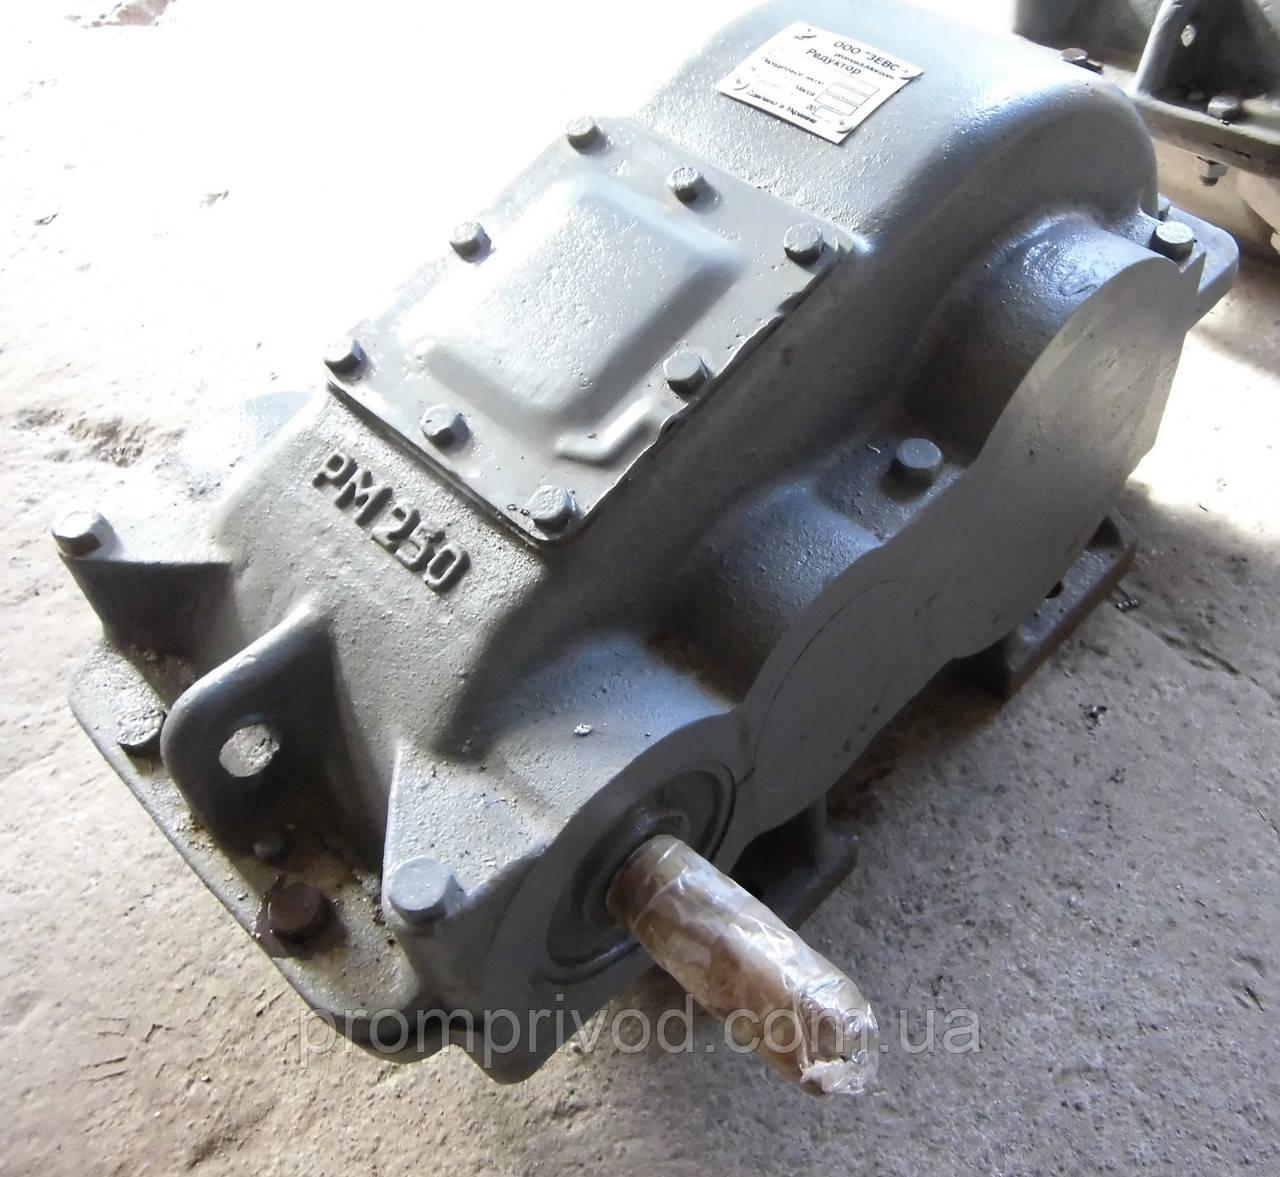 Редуктор РМ-250-10-22